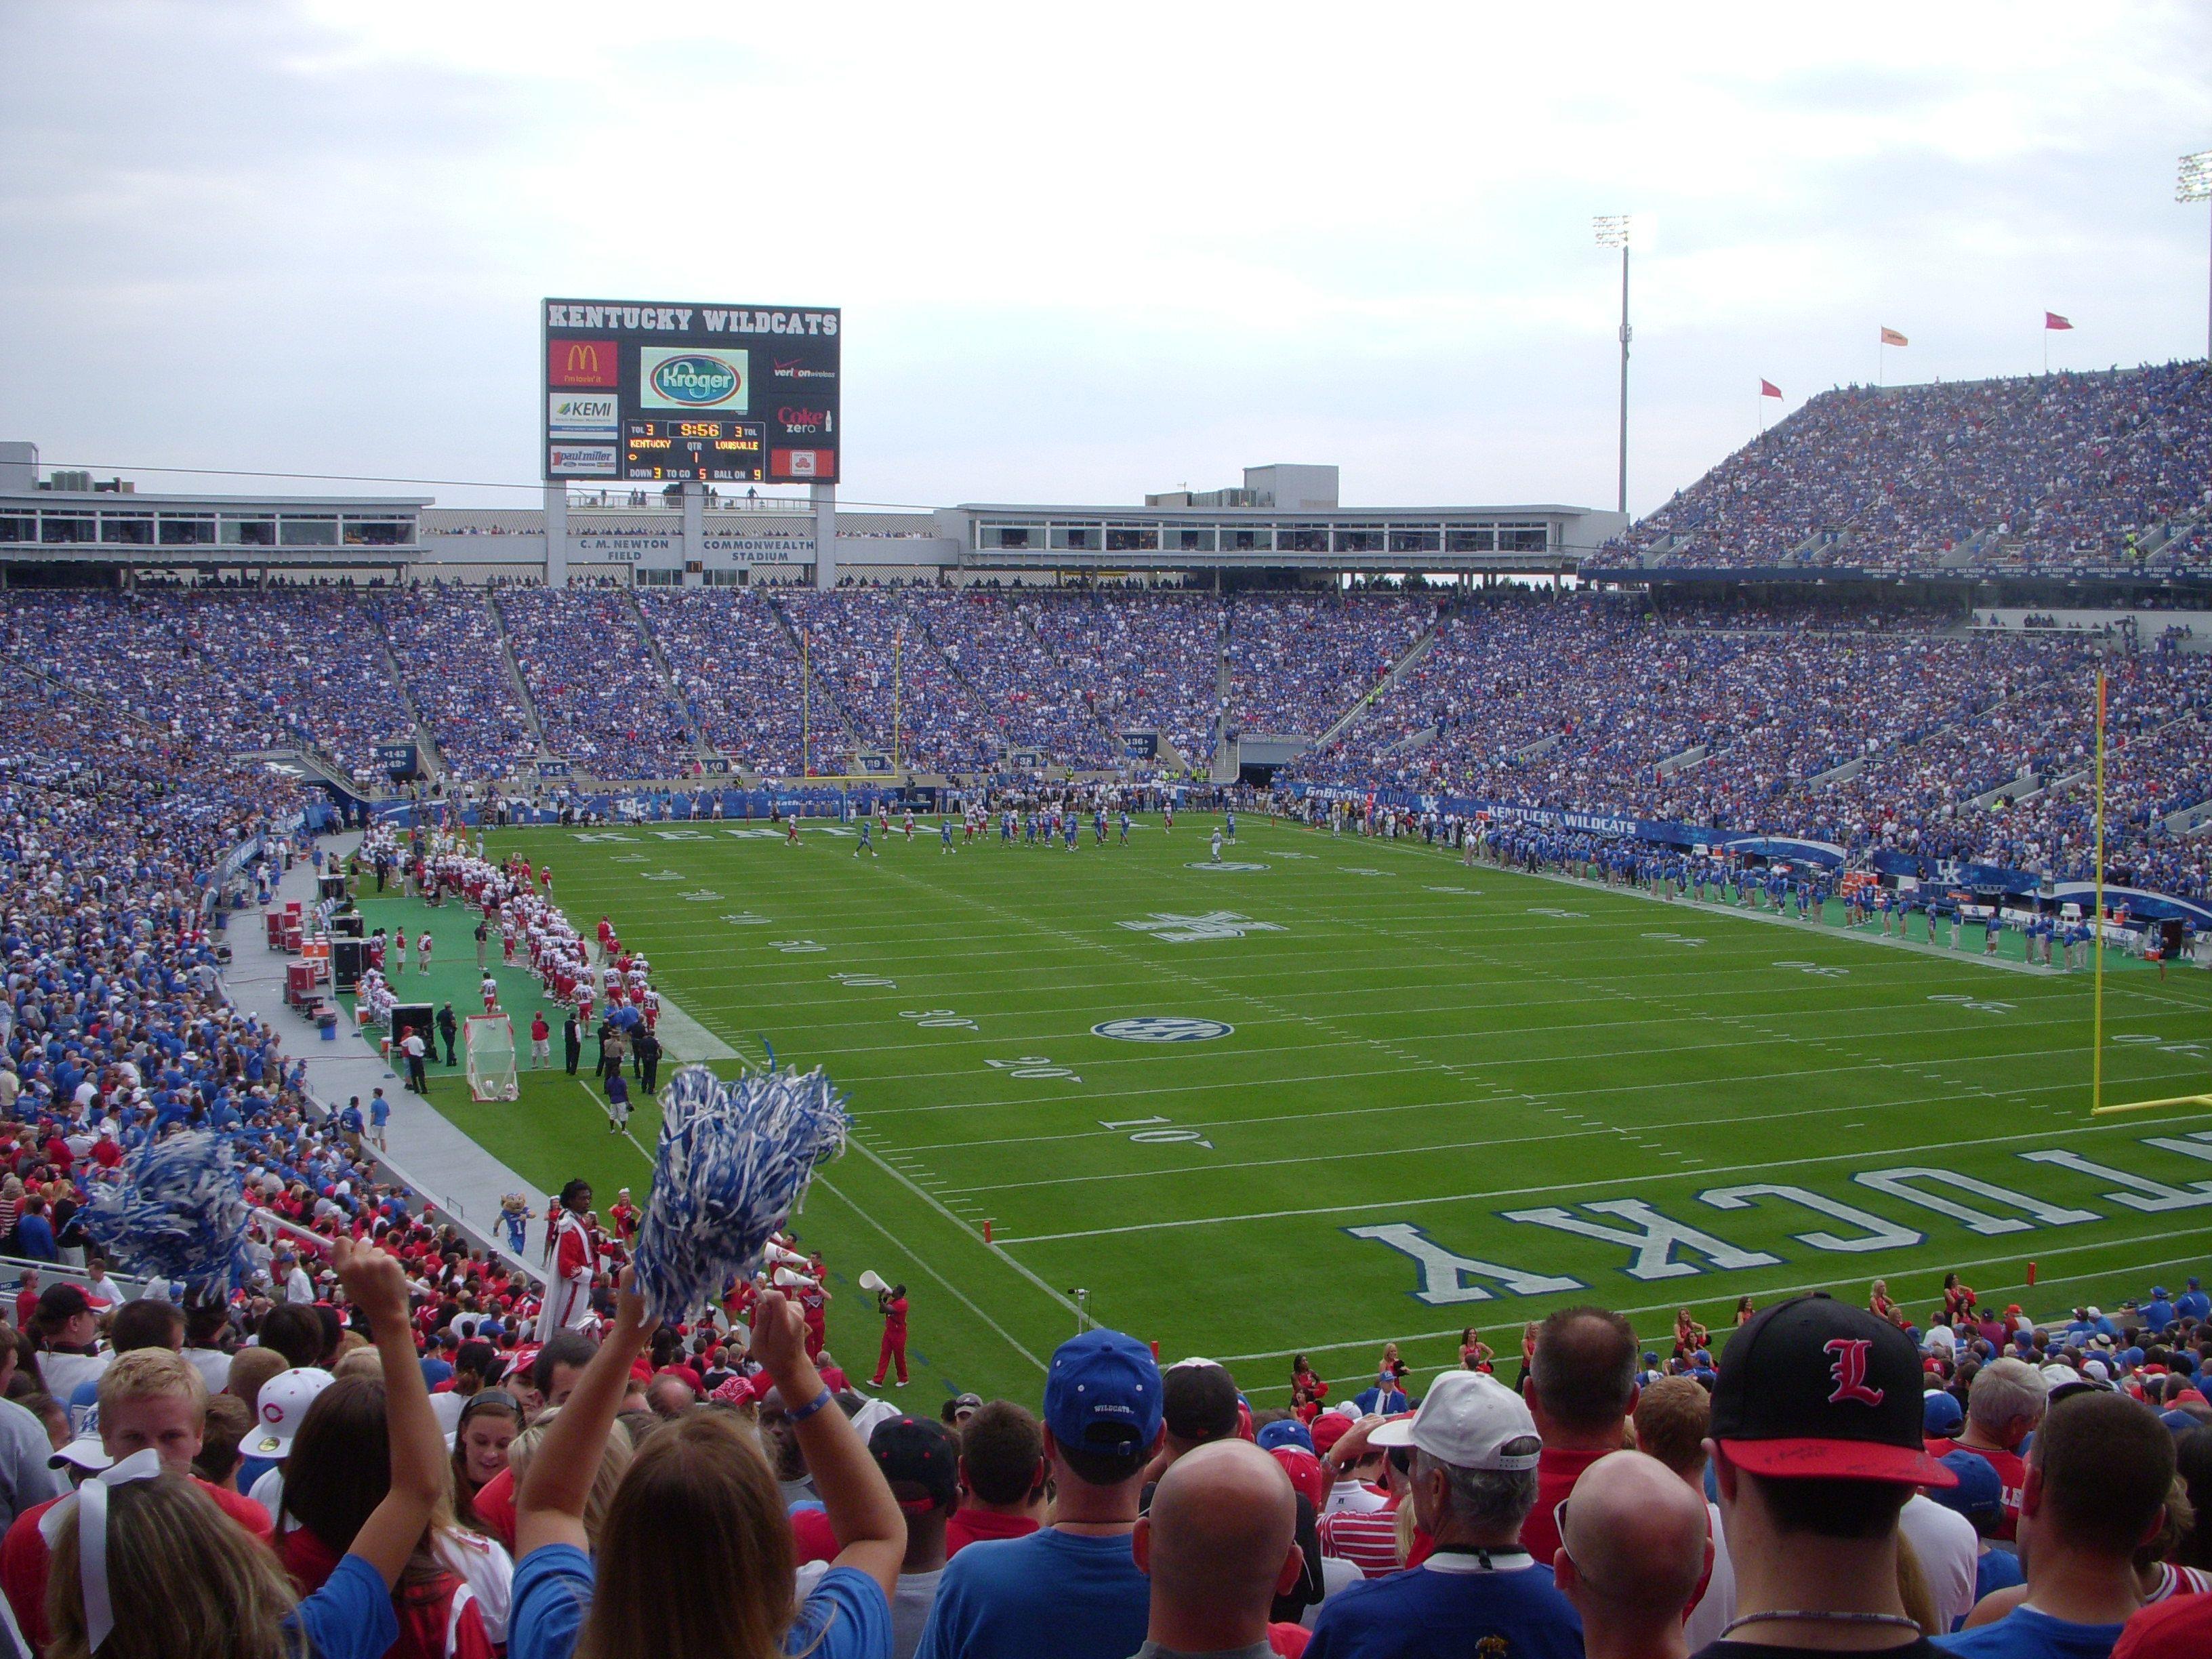 Commonwealth Stadium Football Stadiums University Of Kentucky Stadium